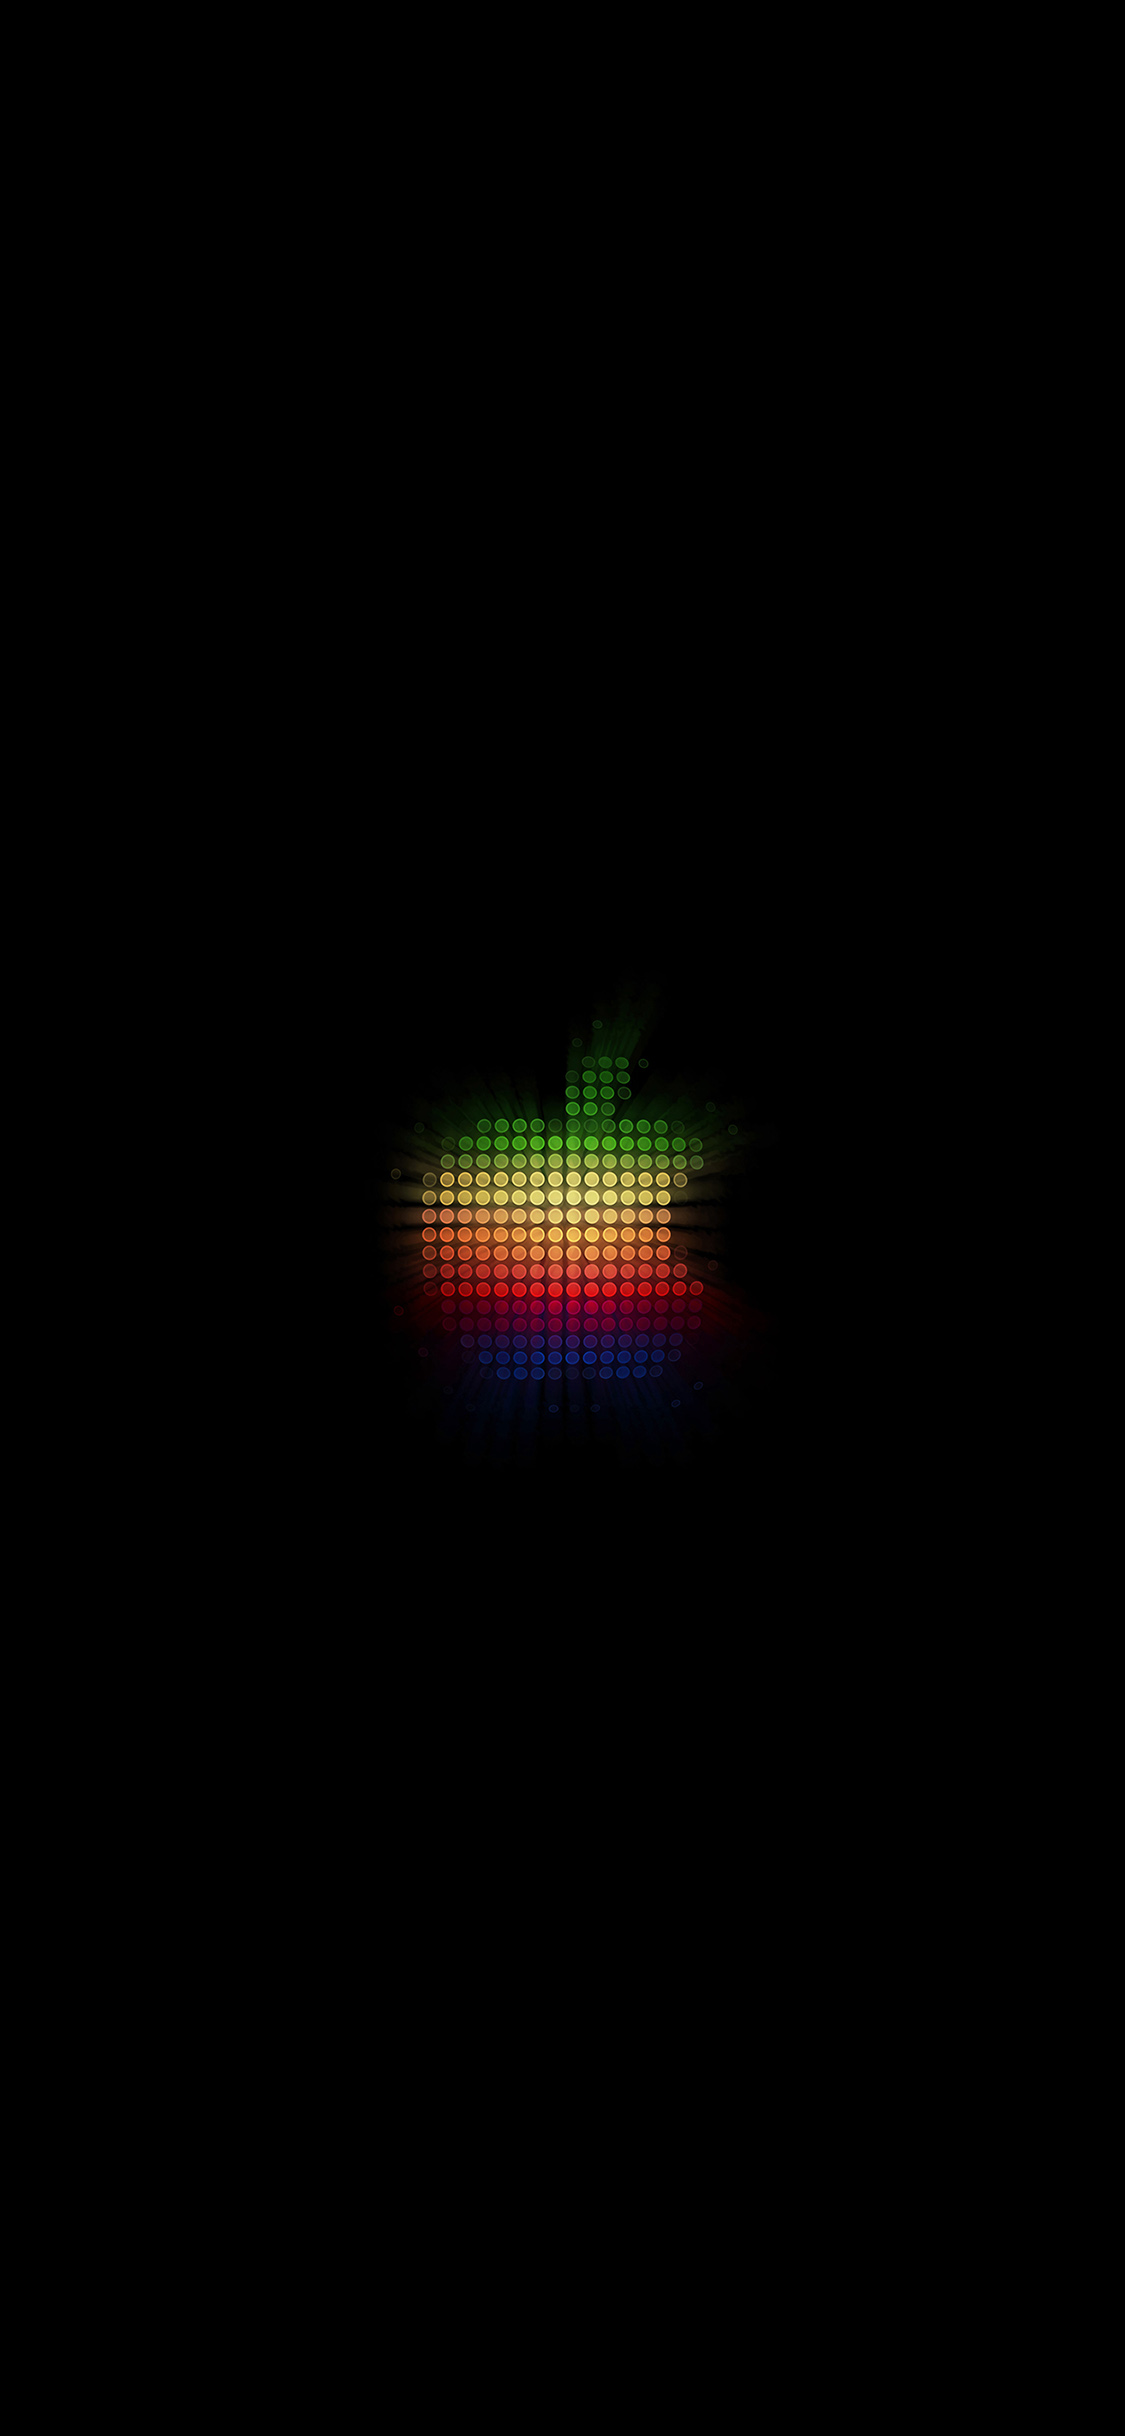 Iphonexpapers Com Iphone X Wallpaper At40 Logo Apple Rainbow